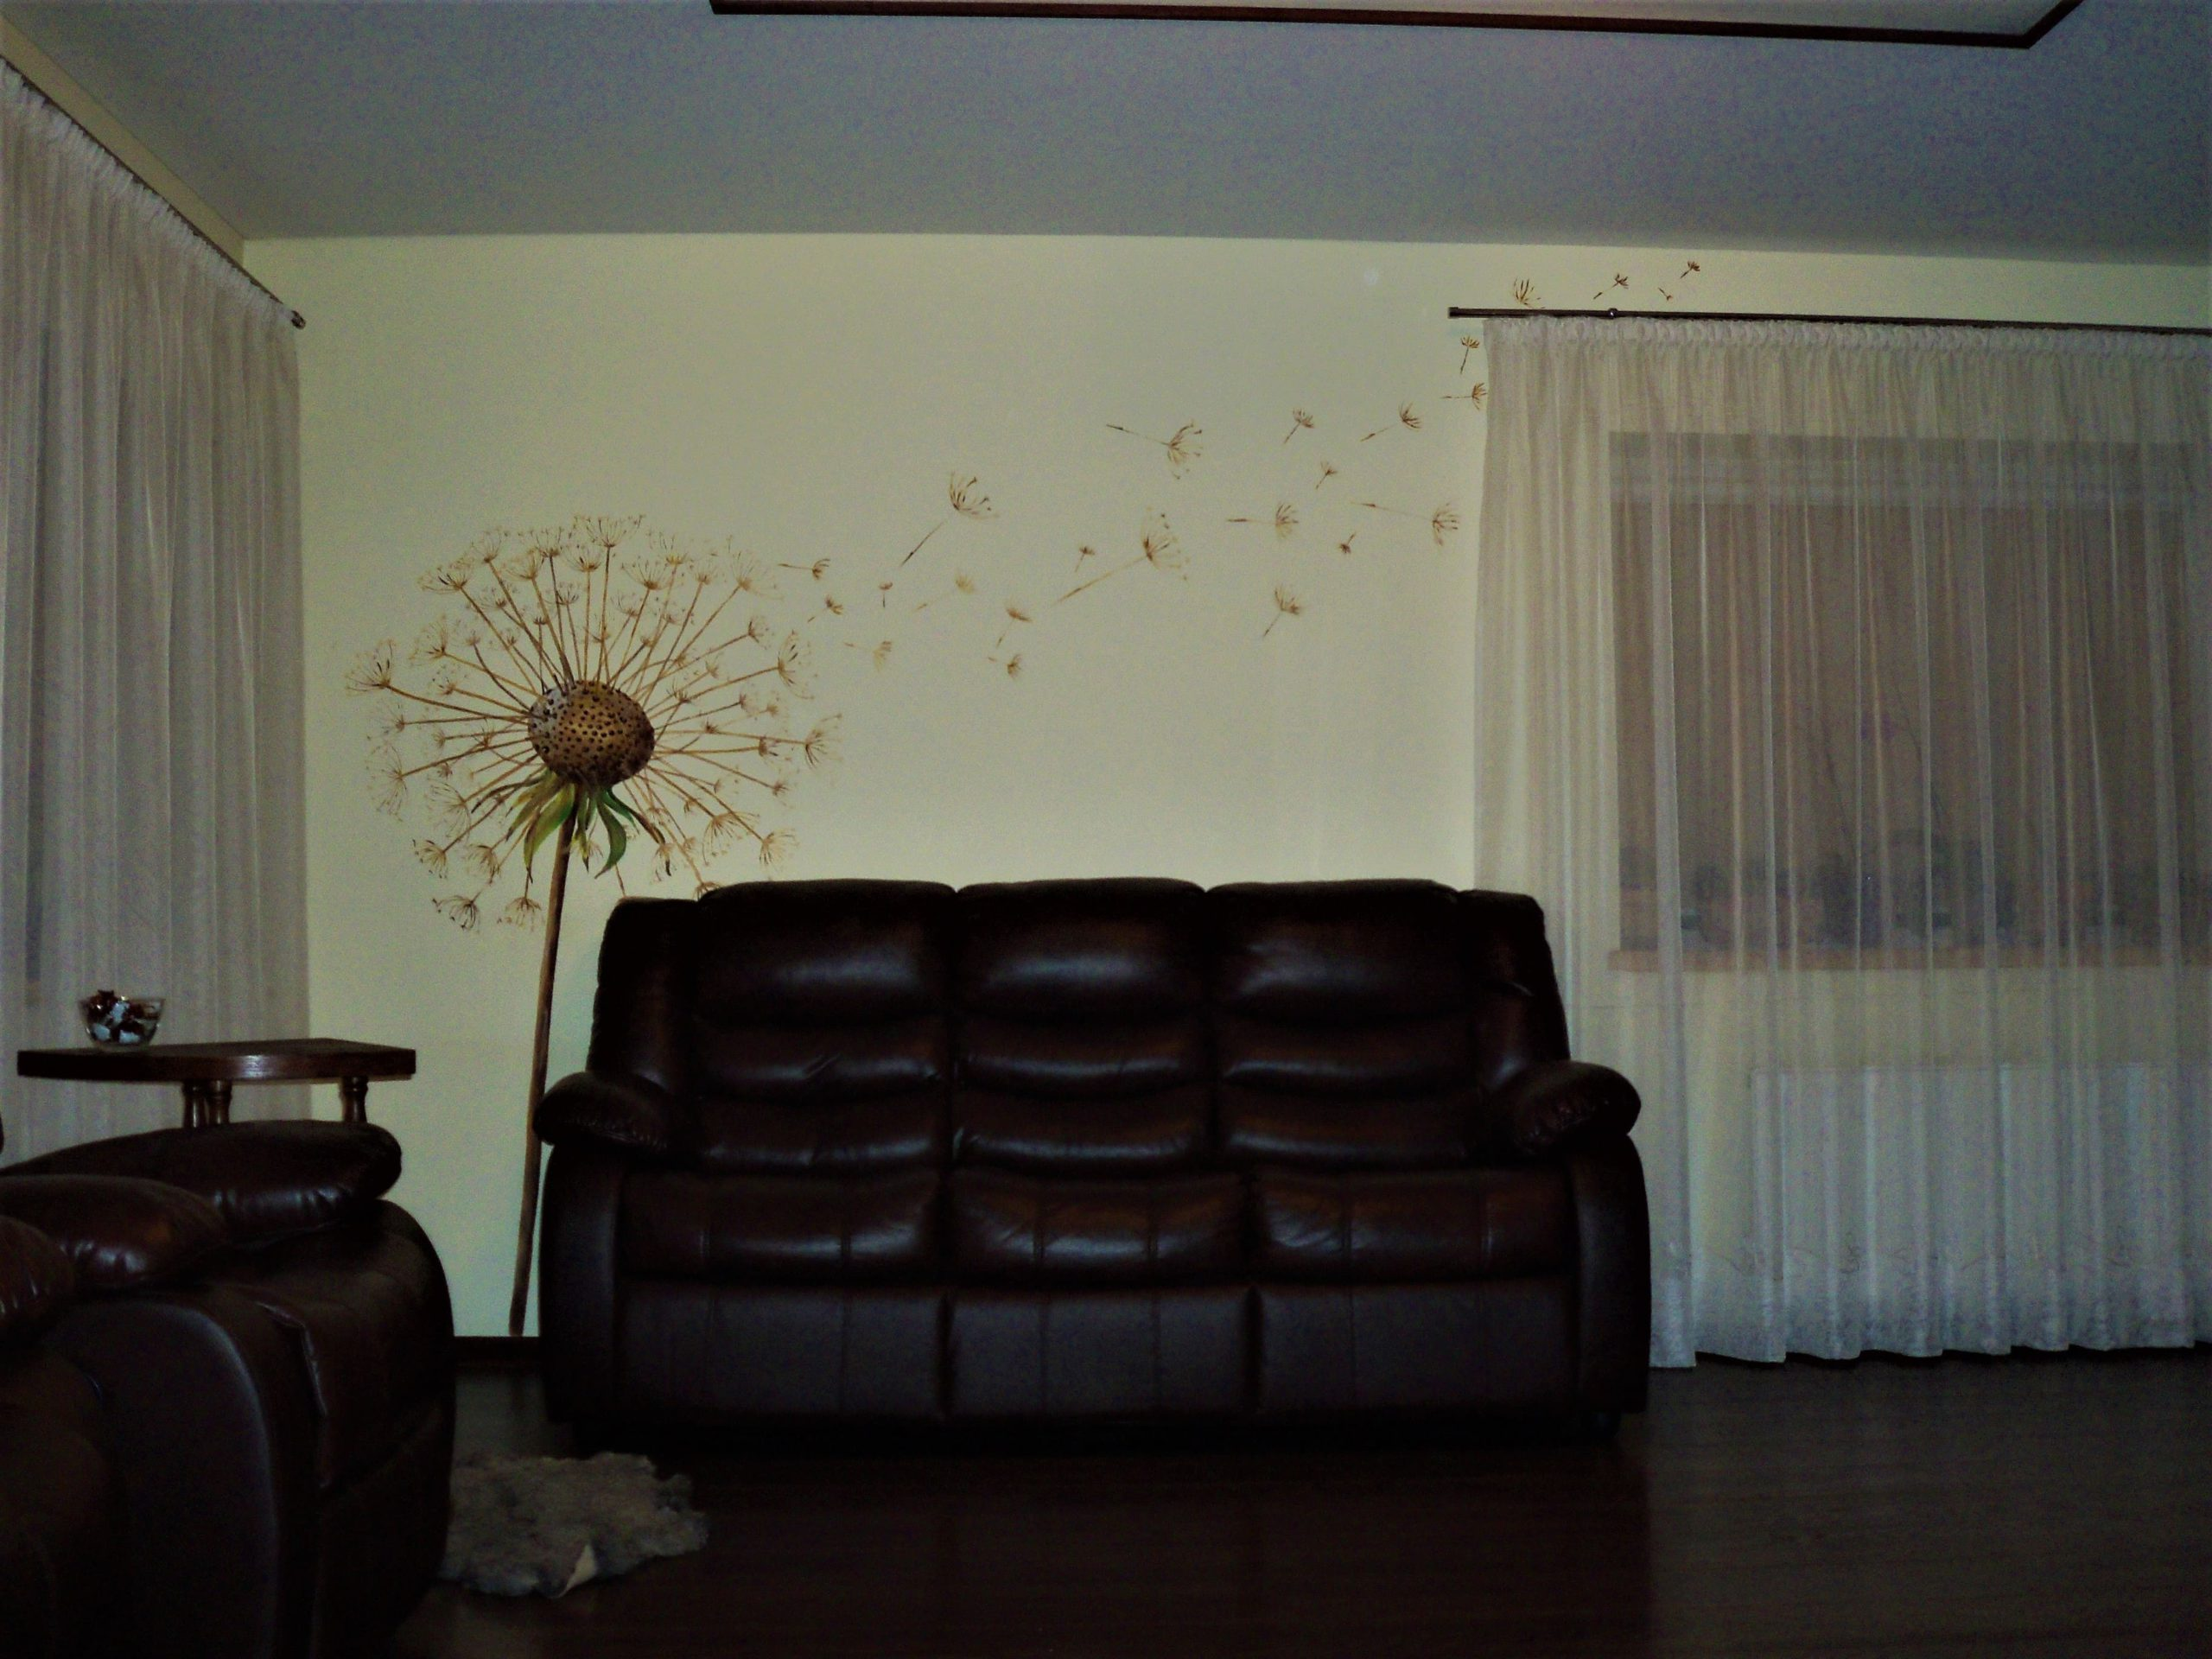 menine-kuryba-sienu-dekoravimas-ivairus-interjerai (45)